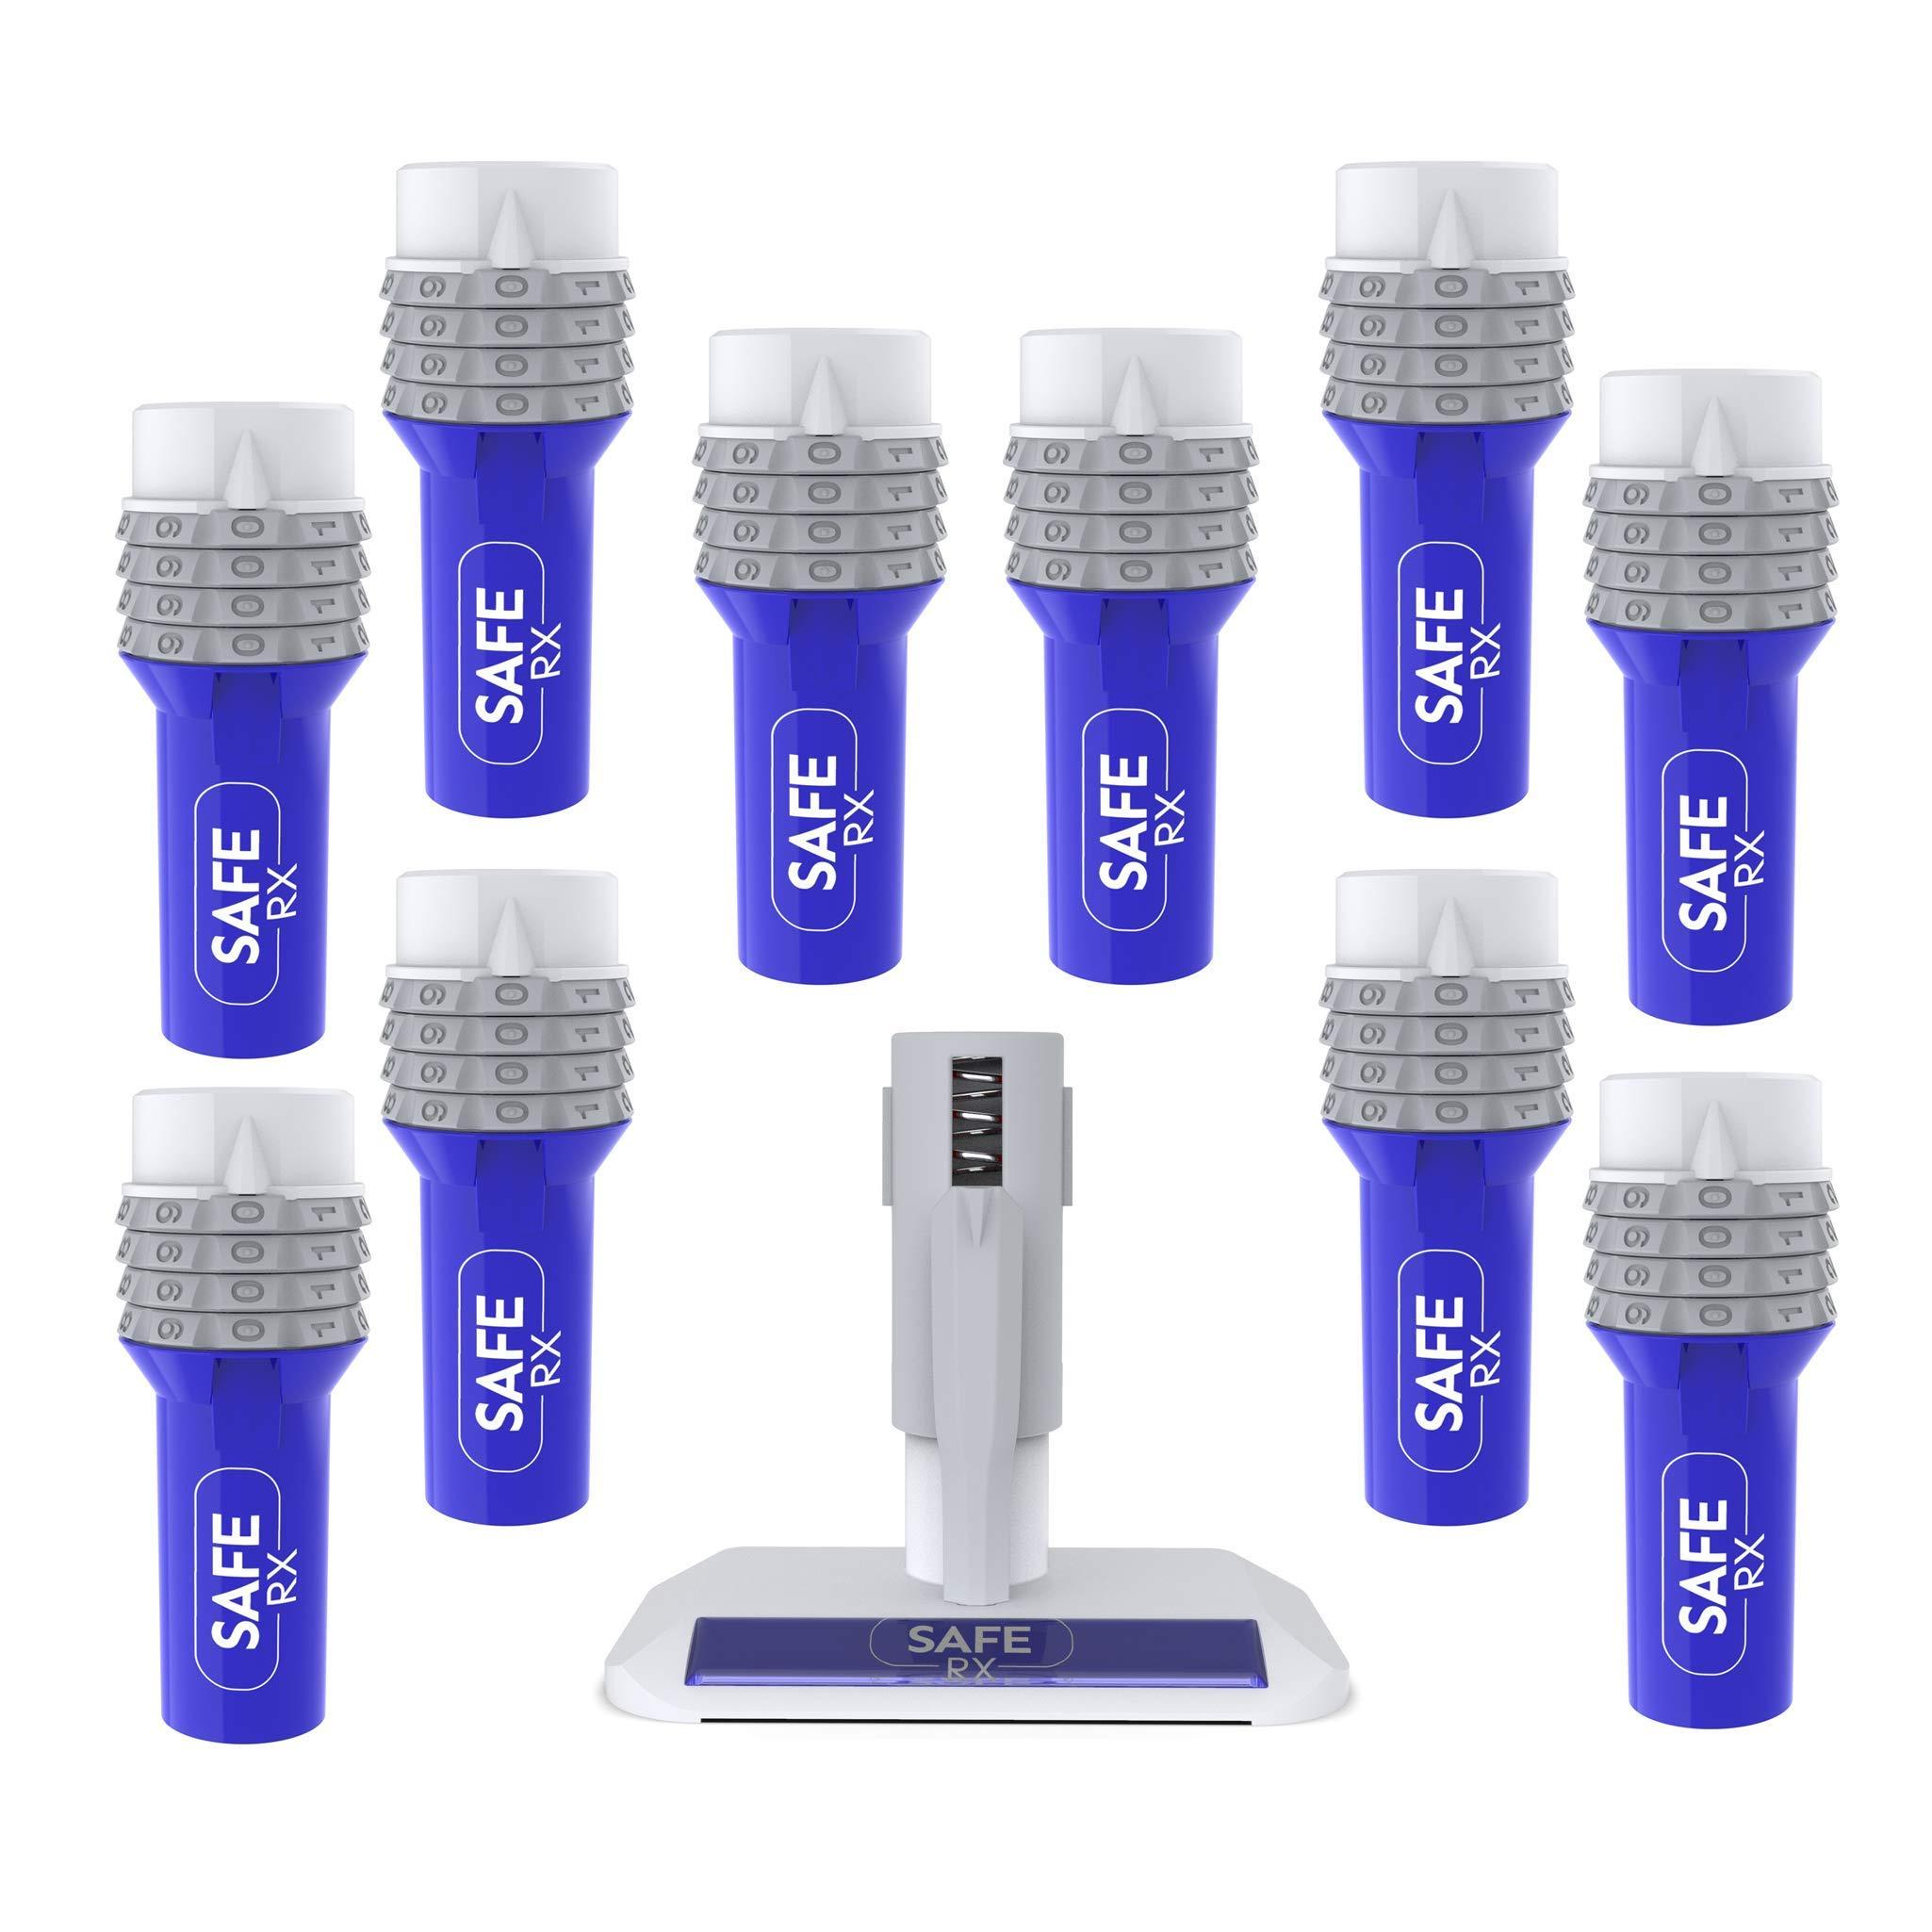 Safe Rx Locking Pill Bottle - Combination Lock - Child Resistant, Tamper Evident, Senior Friendly (Small Bottle, 10-Pack Encoder Kit)